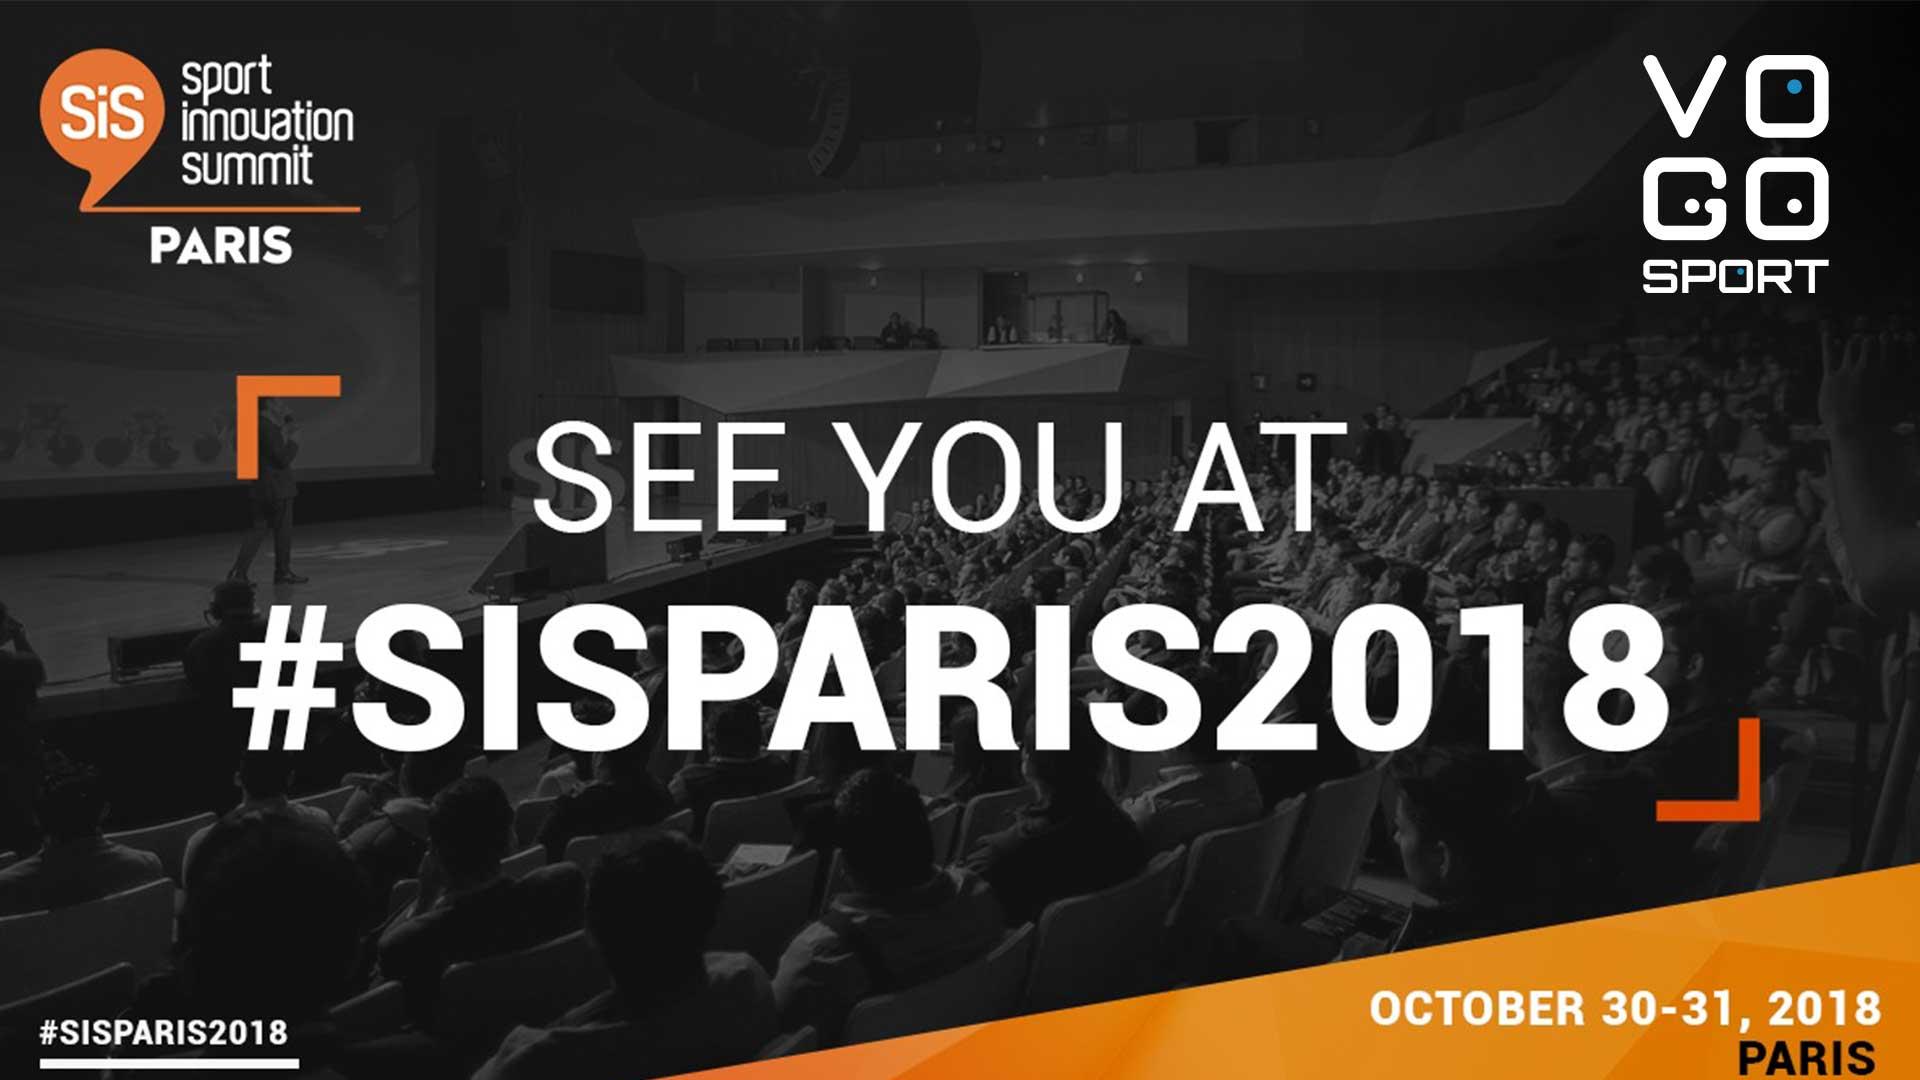 Meet VOGO SPORT at SIS Paris 2018 !